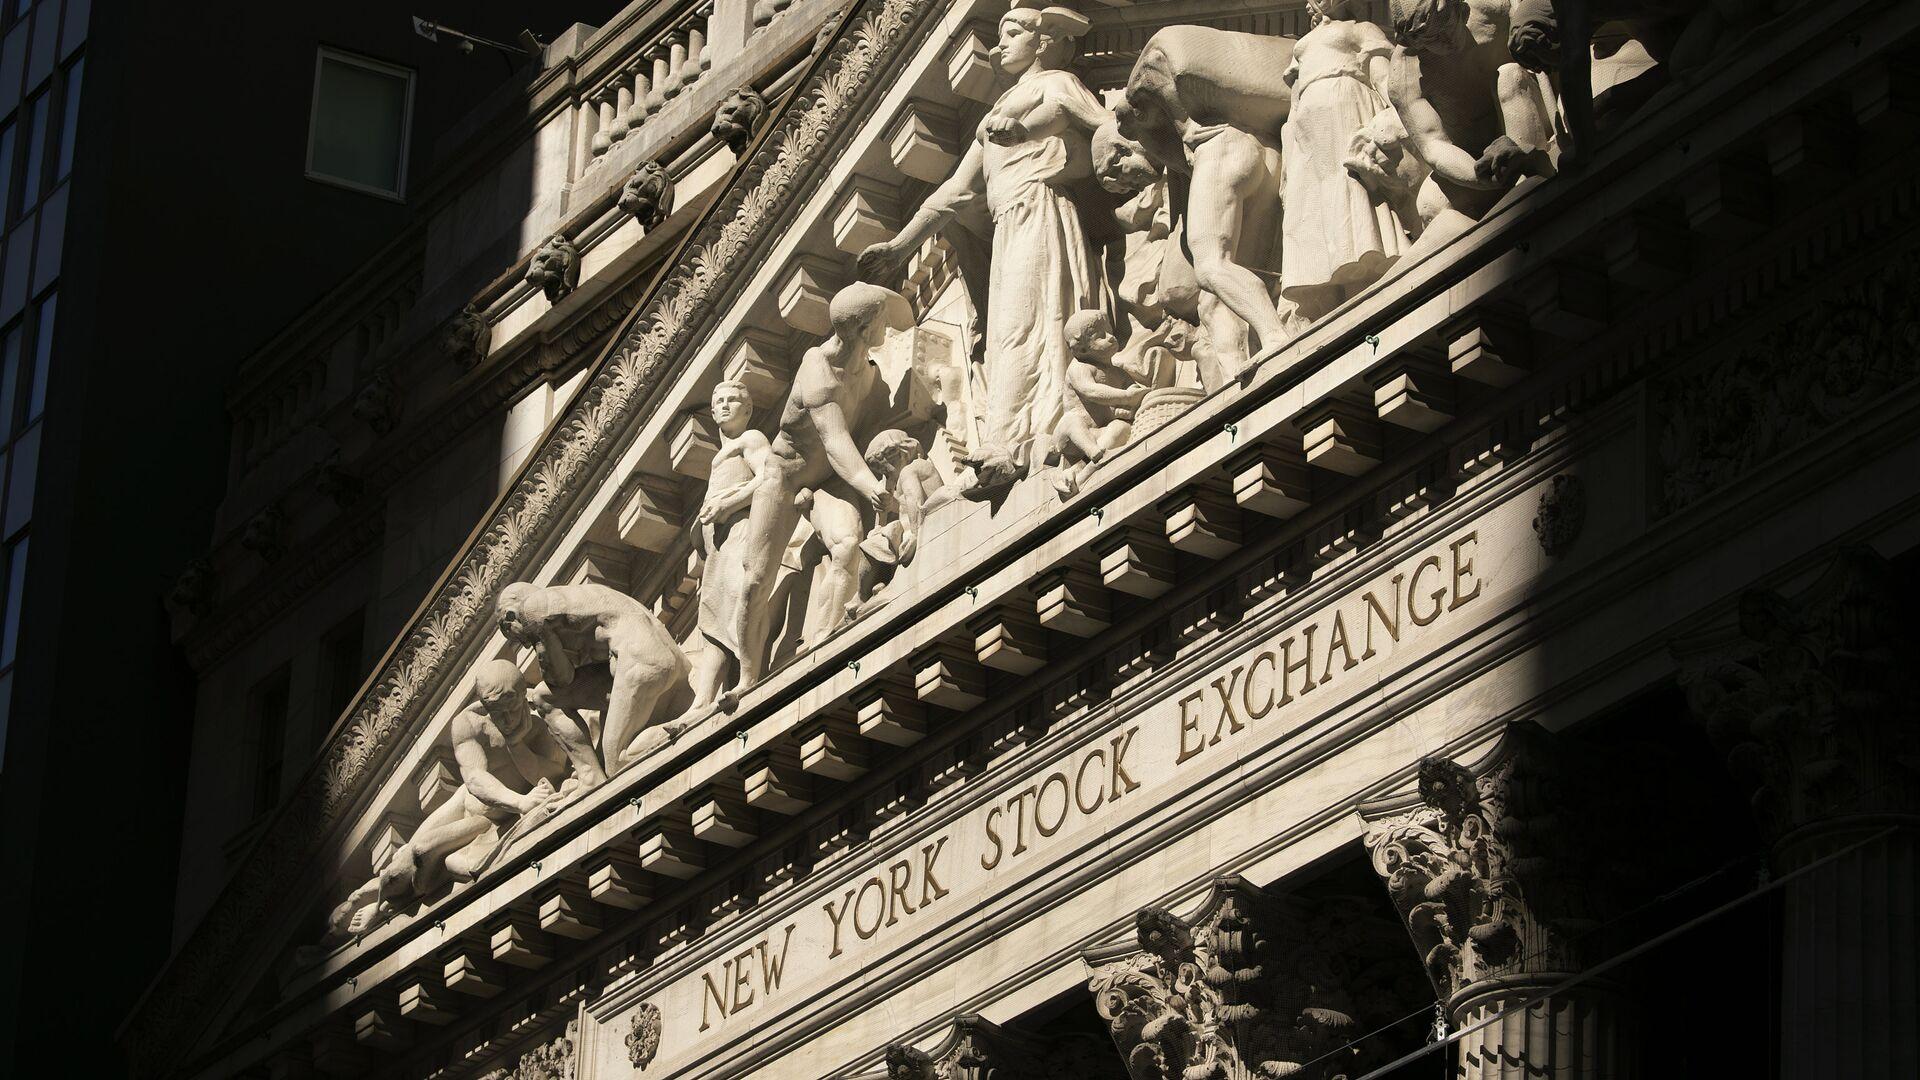 The New York Stock Exchange is shown, Tuesday, July 21, 2020. - Sputnik International, 1920, 23.09.2021